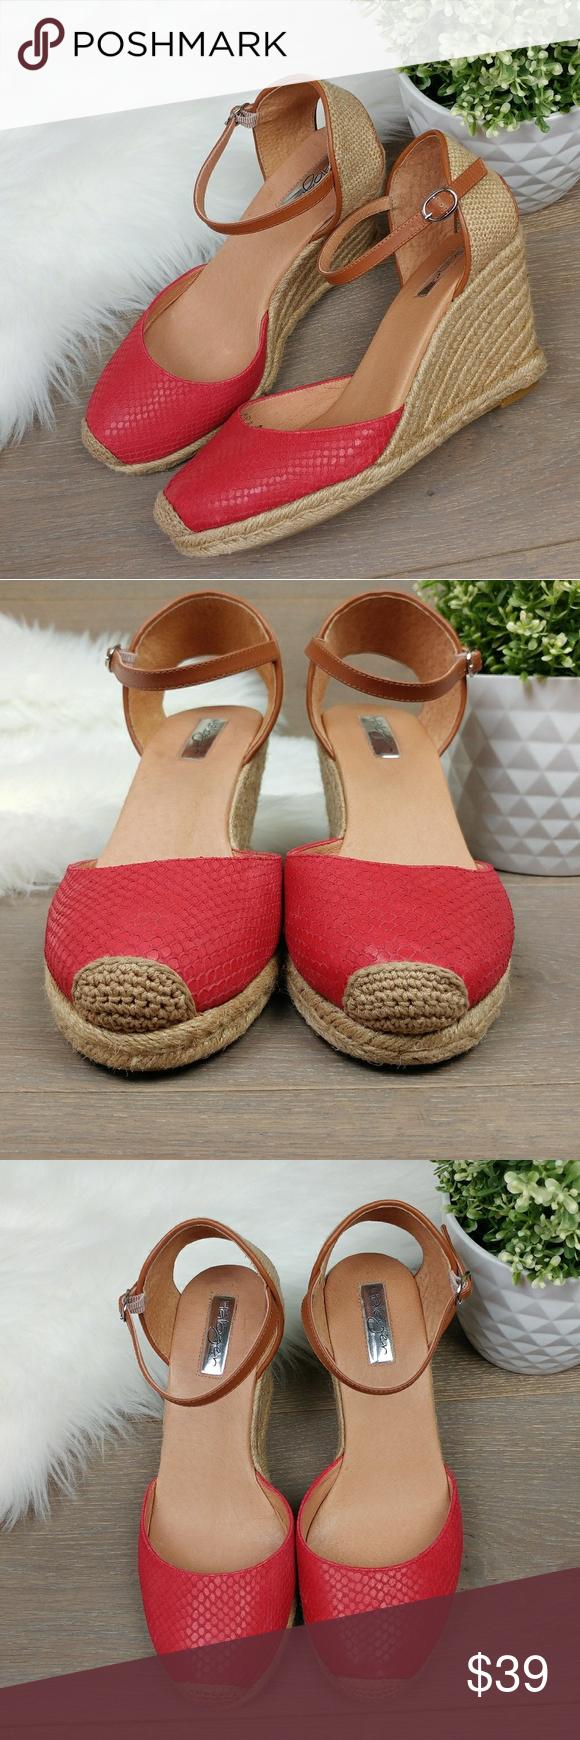 ffb2dd3072a9 Halogen Sandra Wedge Espadrilles Red leather Halogen Sandra Wedge  Espadrilles Red leather Size 8.5 3 1